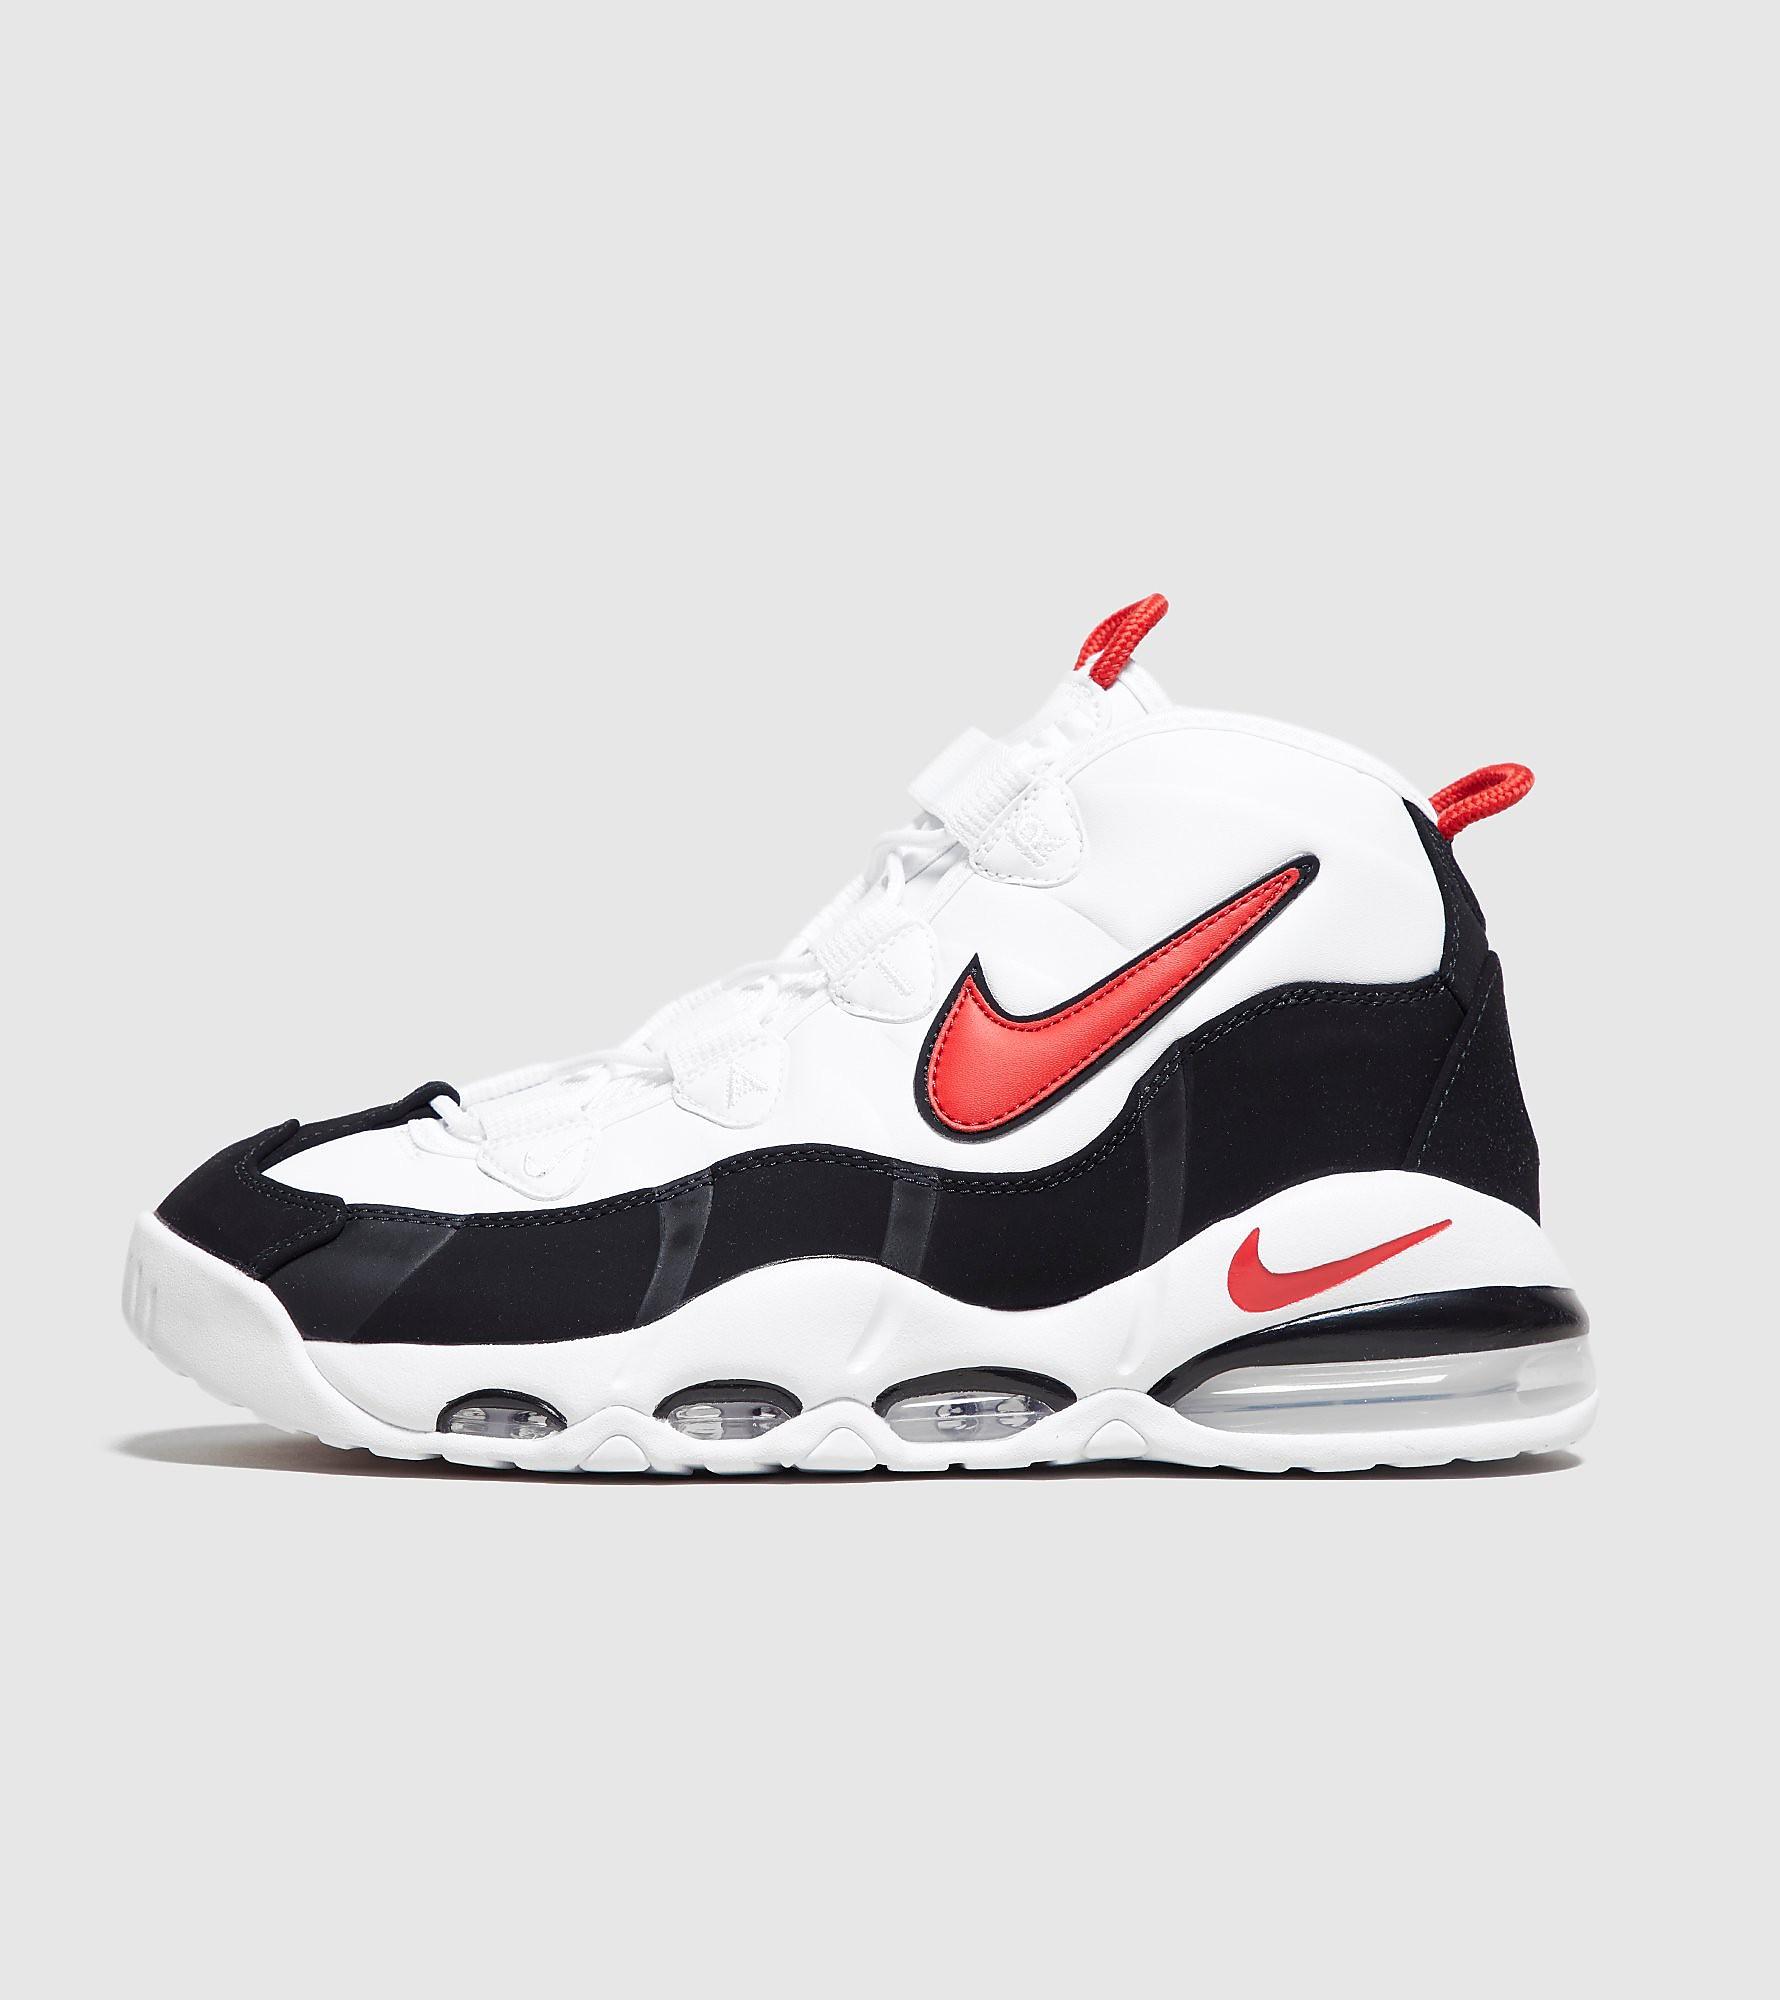 Nike Air Max Uptempo 95, White